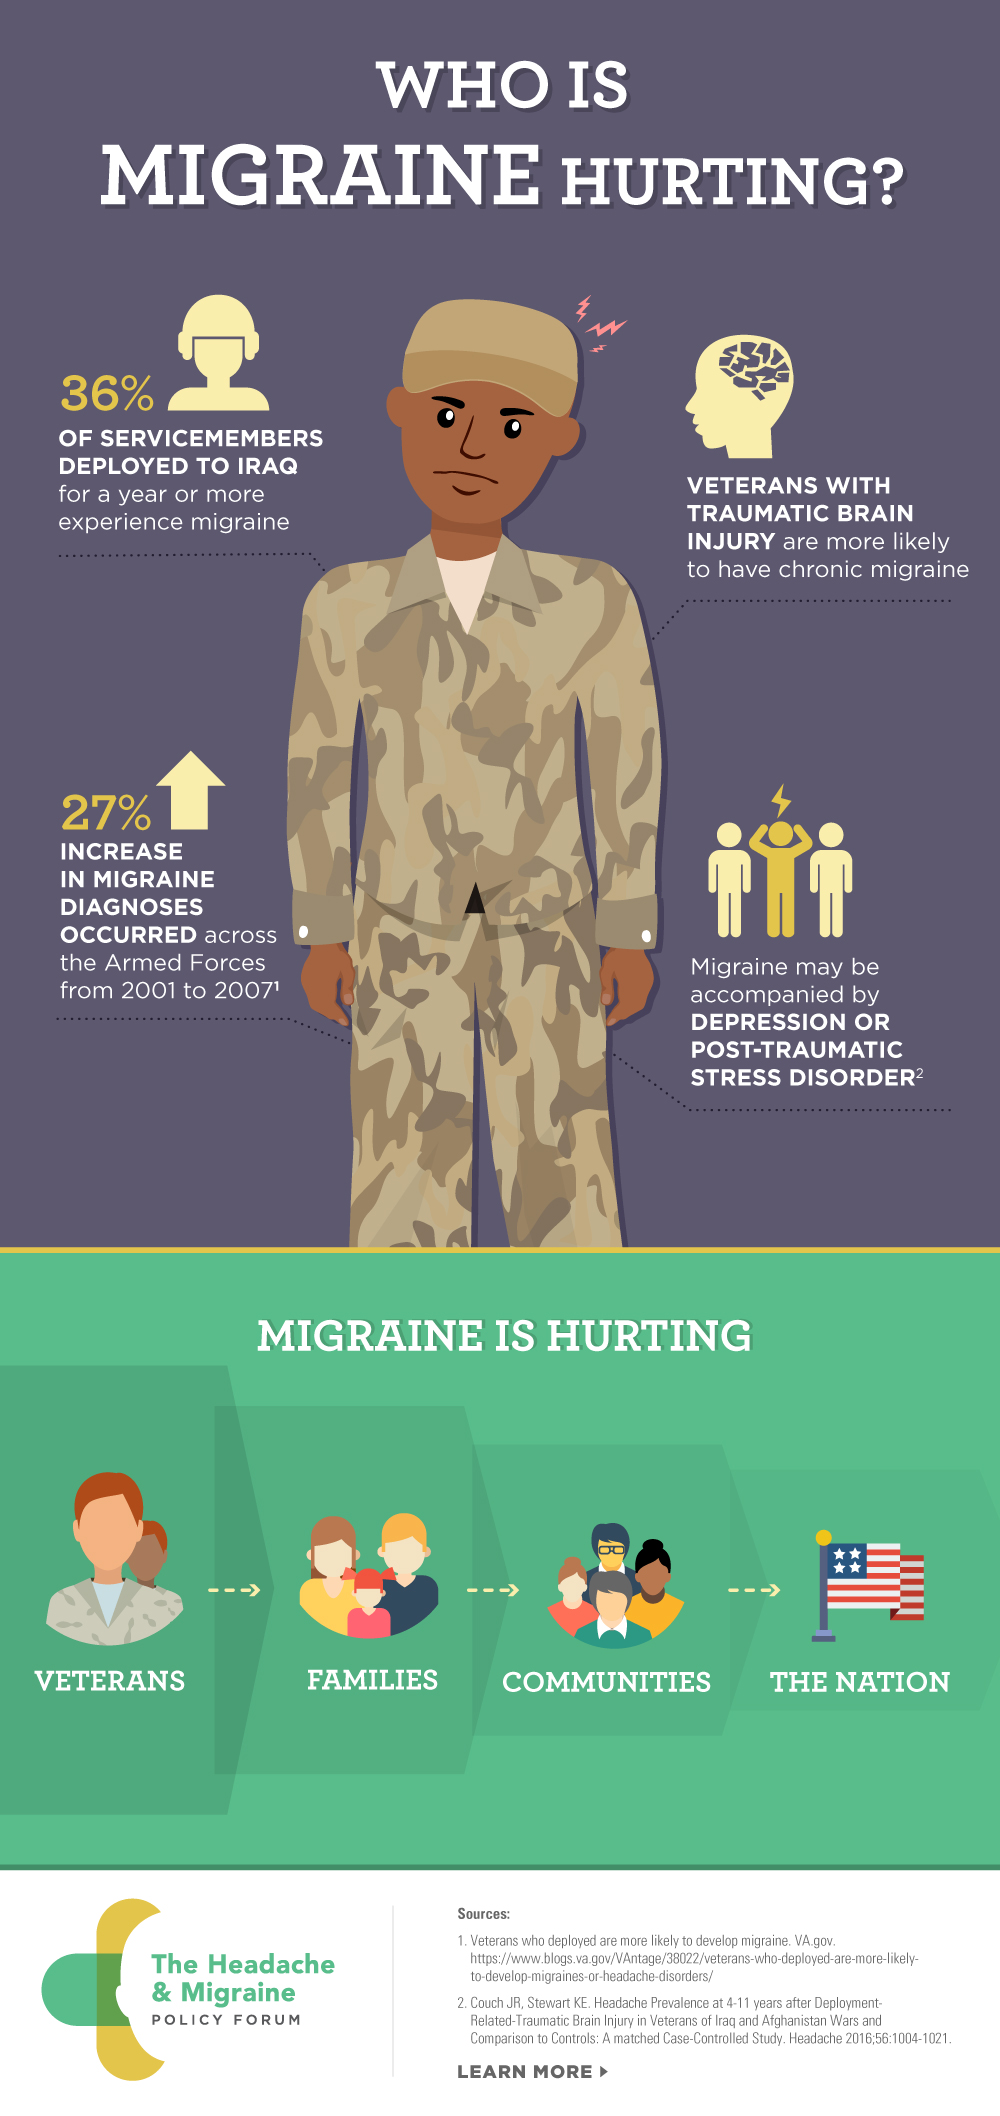 HMPF_Migraine_Veteran_Infographic_Nov 2017 (1).jpg